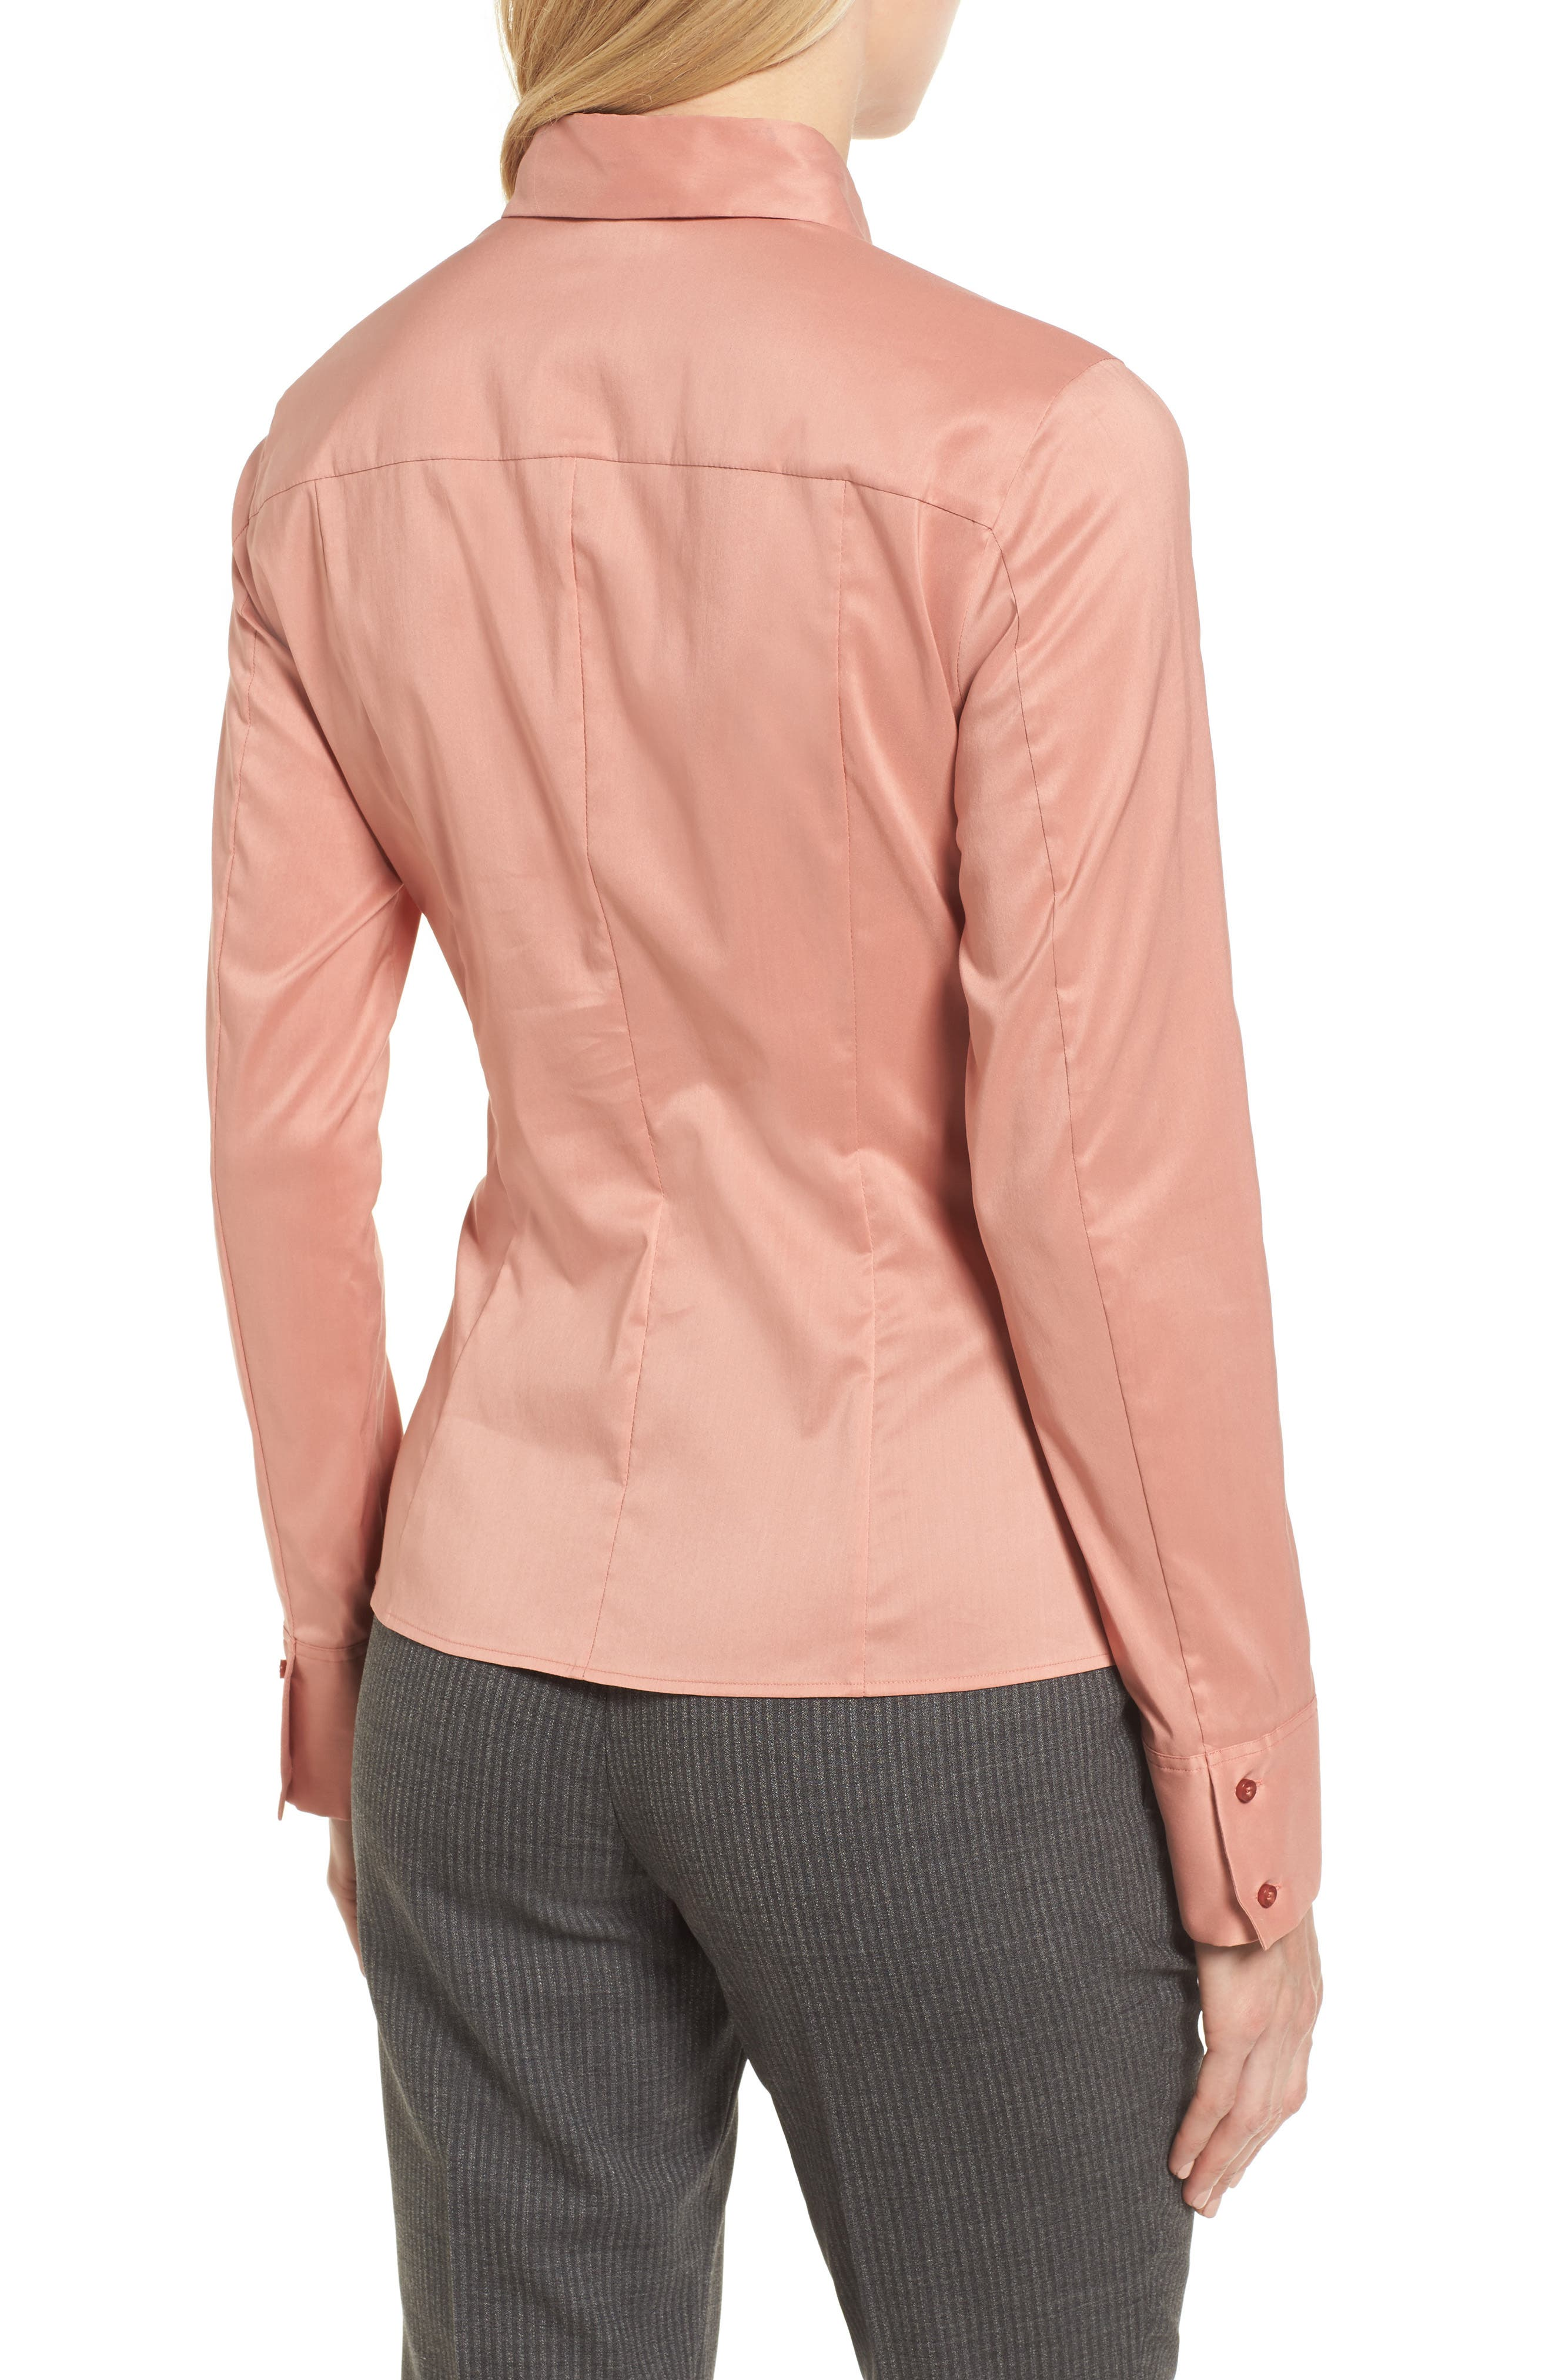 Bashina Fitted Stretch Poplin Shirt,                             Alternate thumbnail 2, color,                             Sand Rose